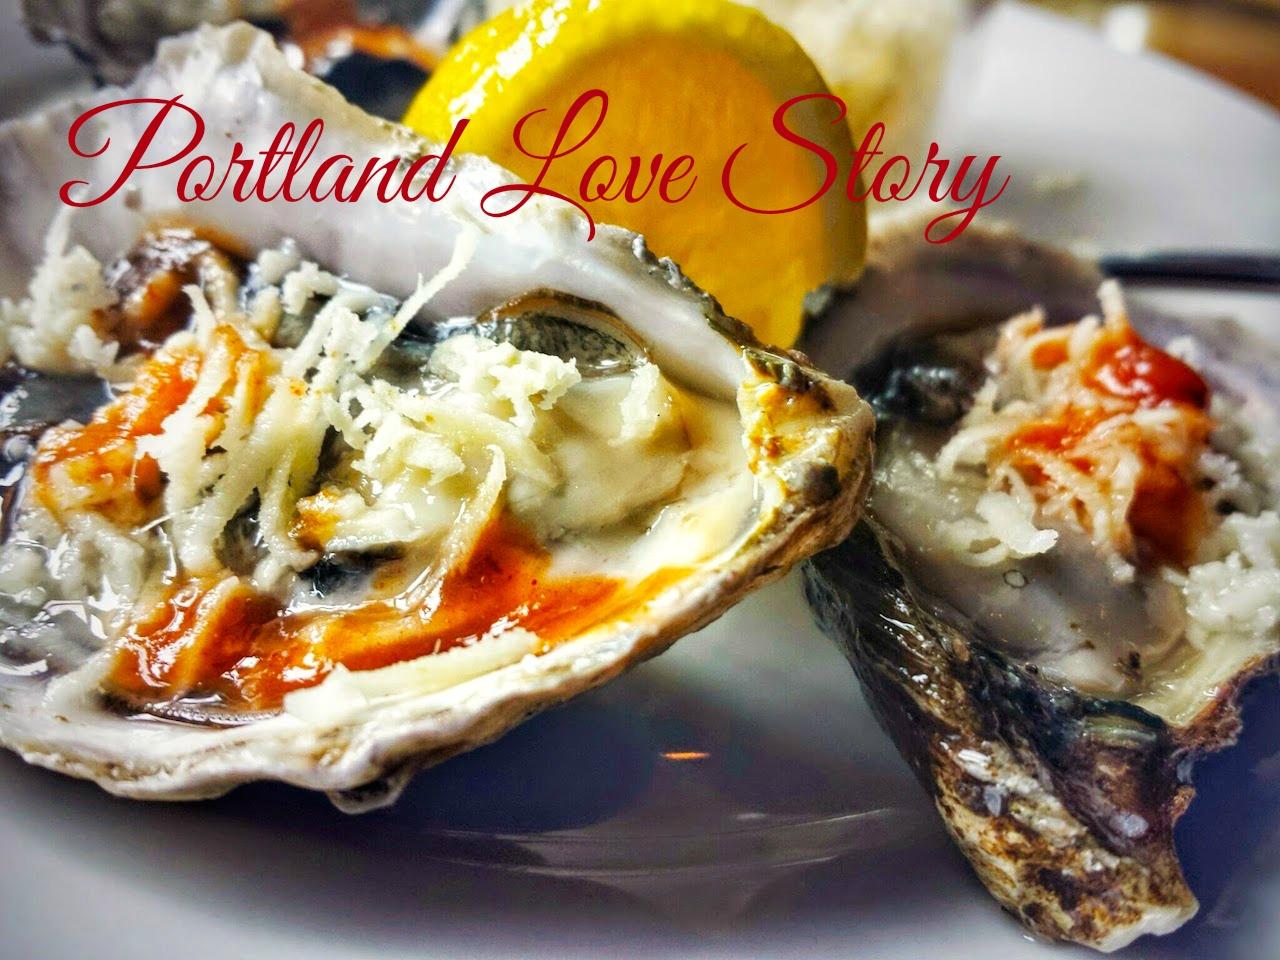 Portland Love Story